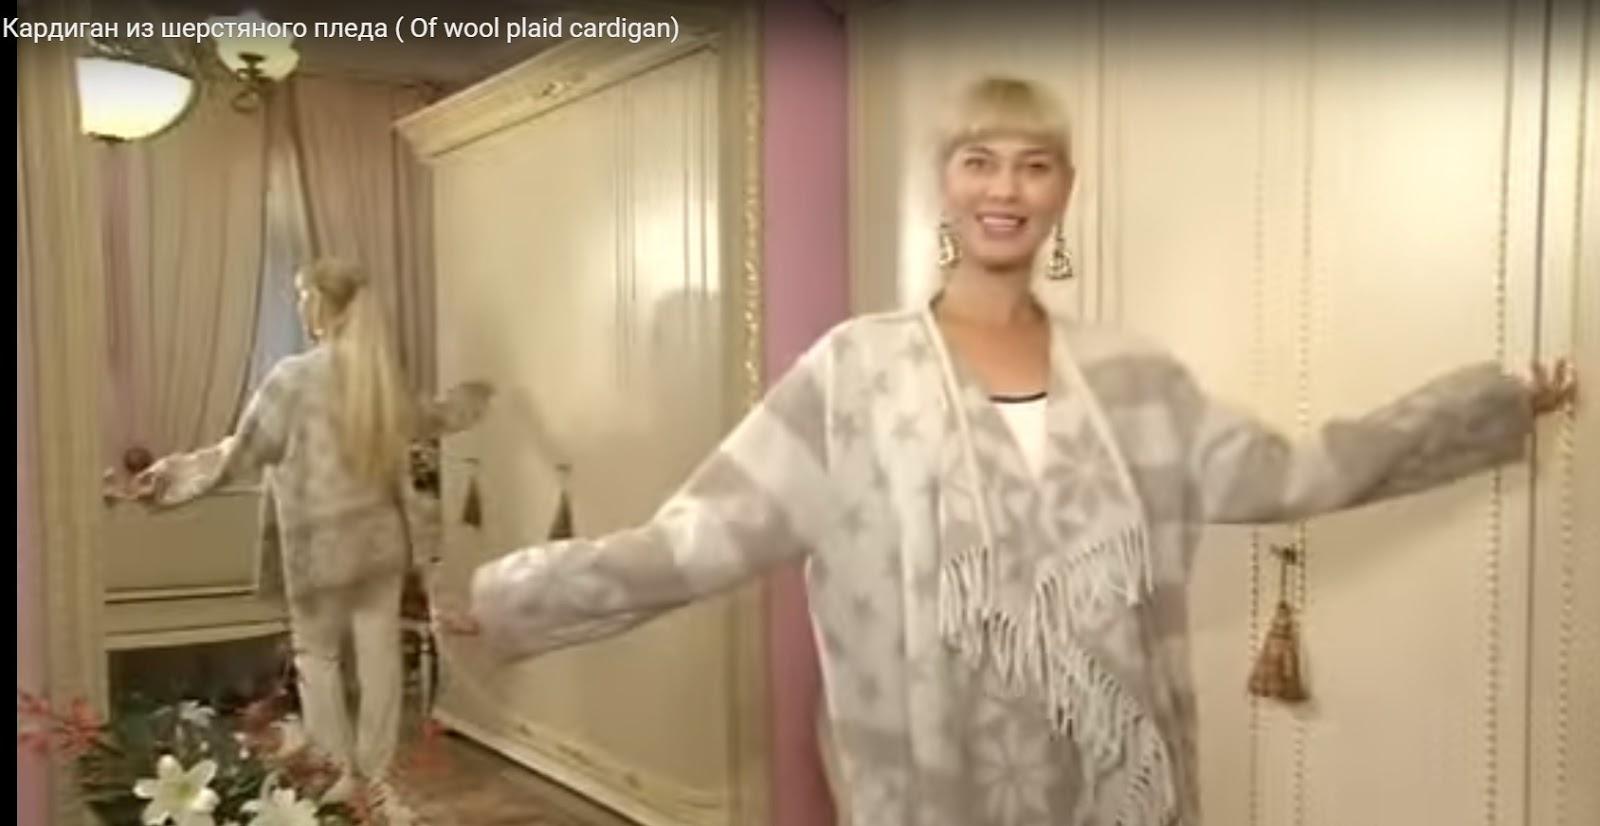 Анна никишечева пальто из пледа